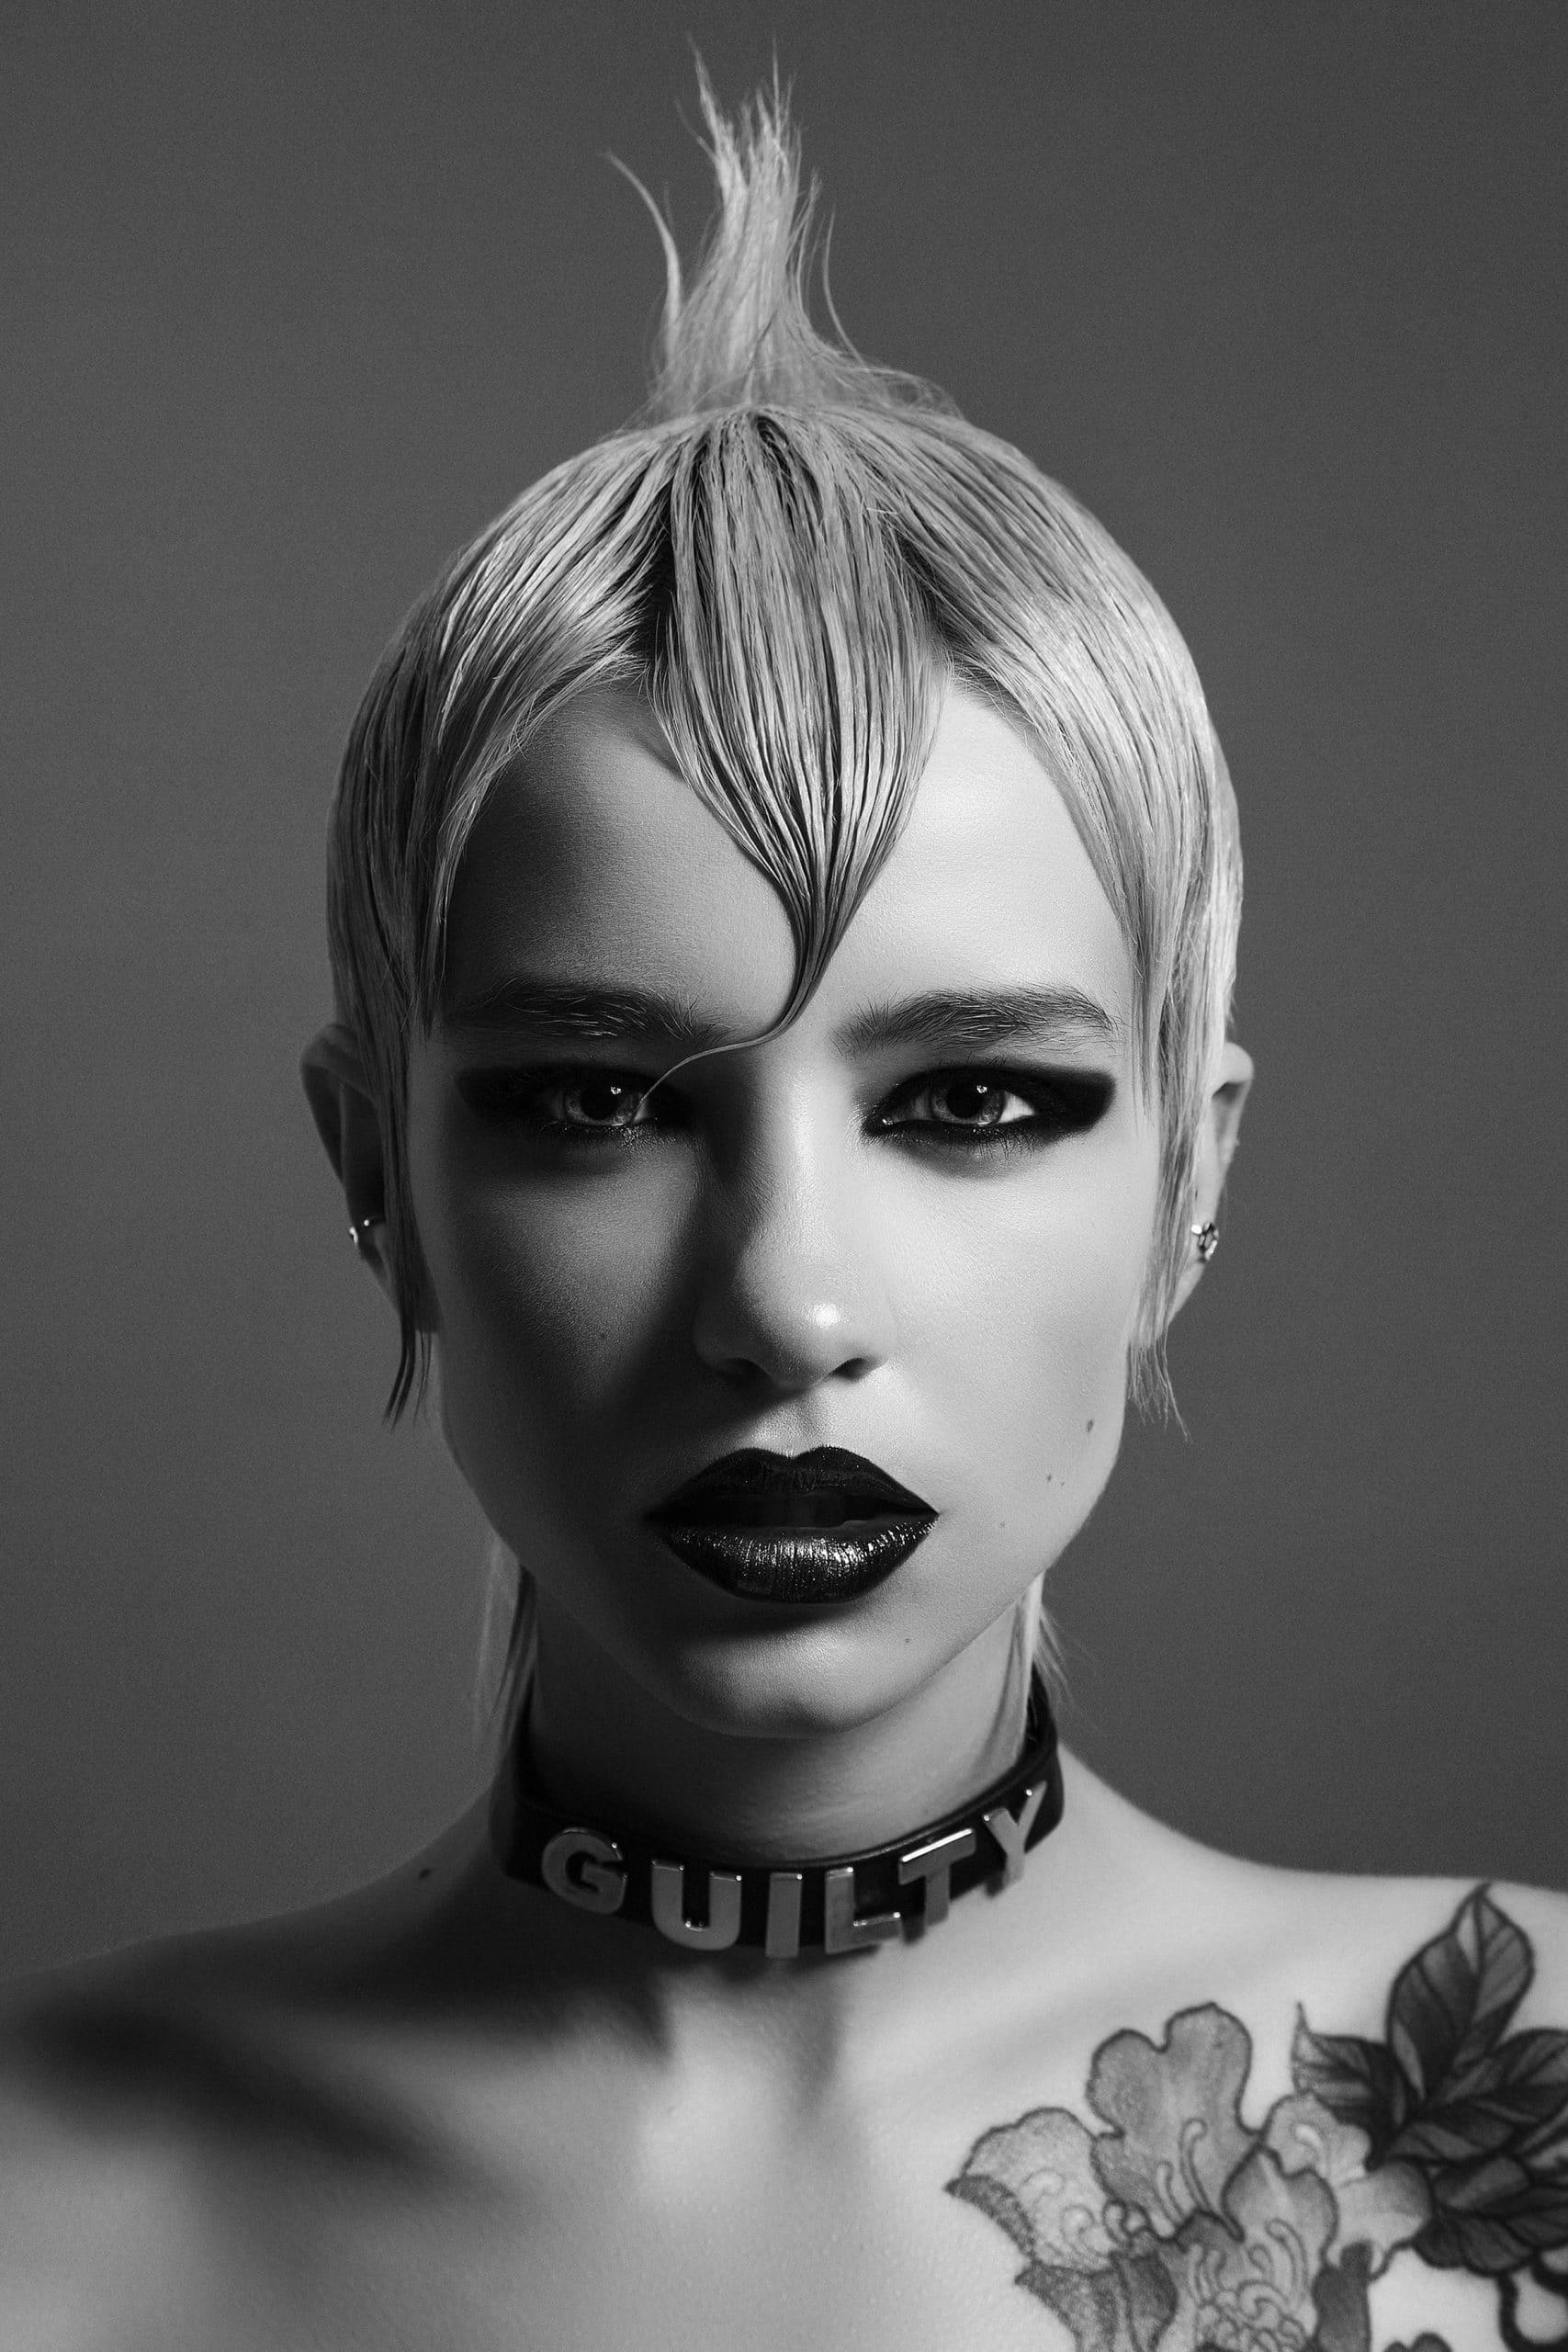 GUILTY @Salon Blue by Raquel Saiz 2 scaled